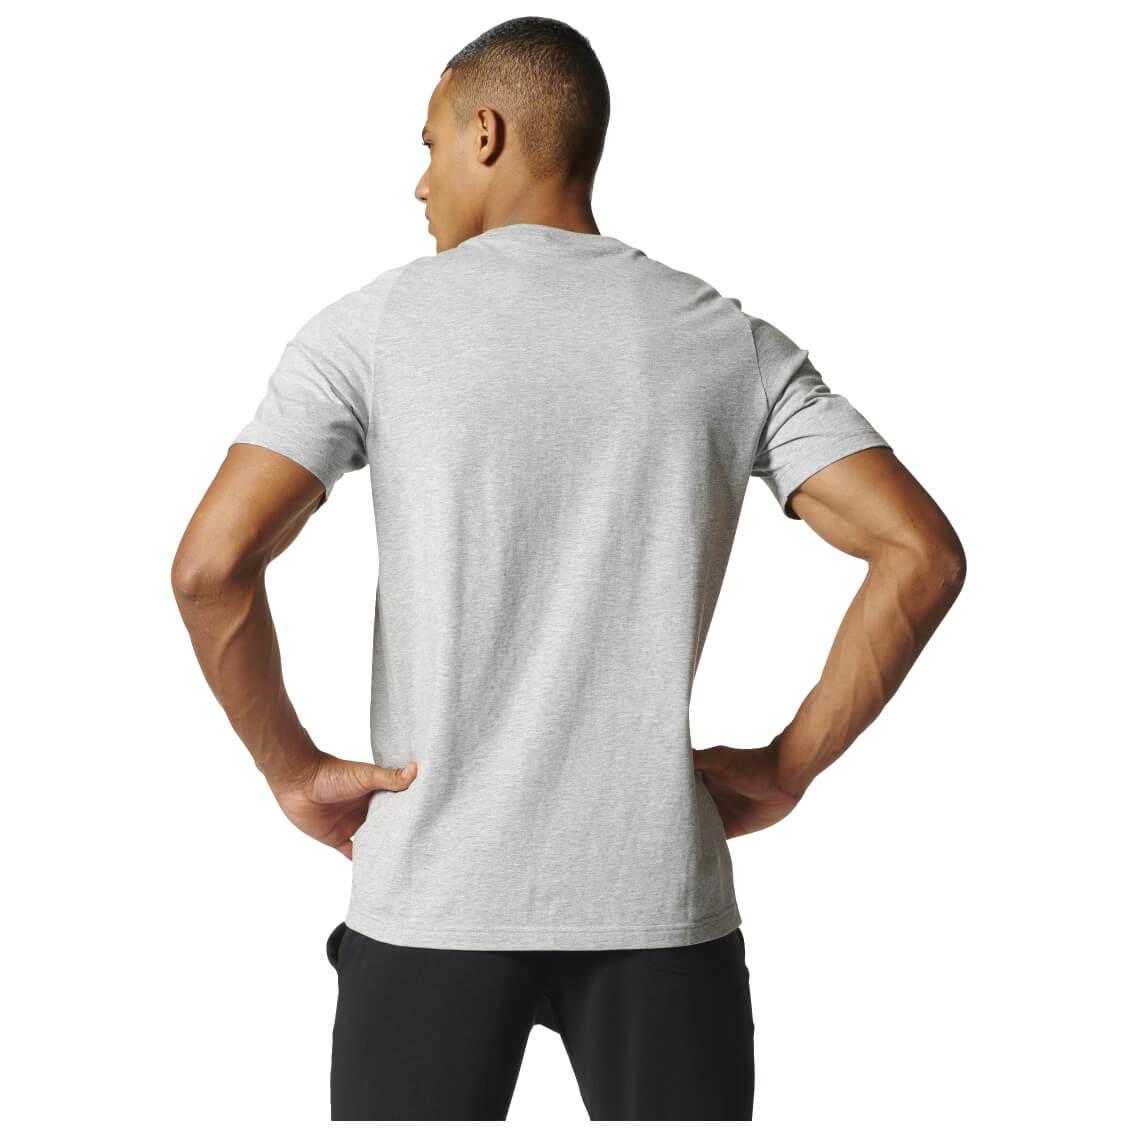 adidas sport id branded tee t shirt men 39 s buy online. Black Bedroom Furniture Sets. Home Design Ideas